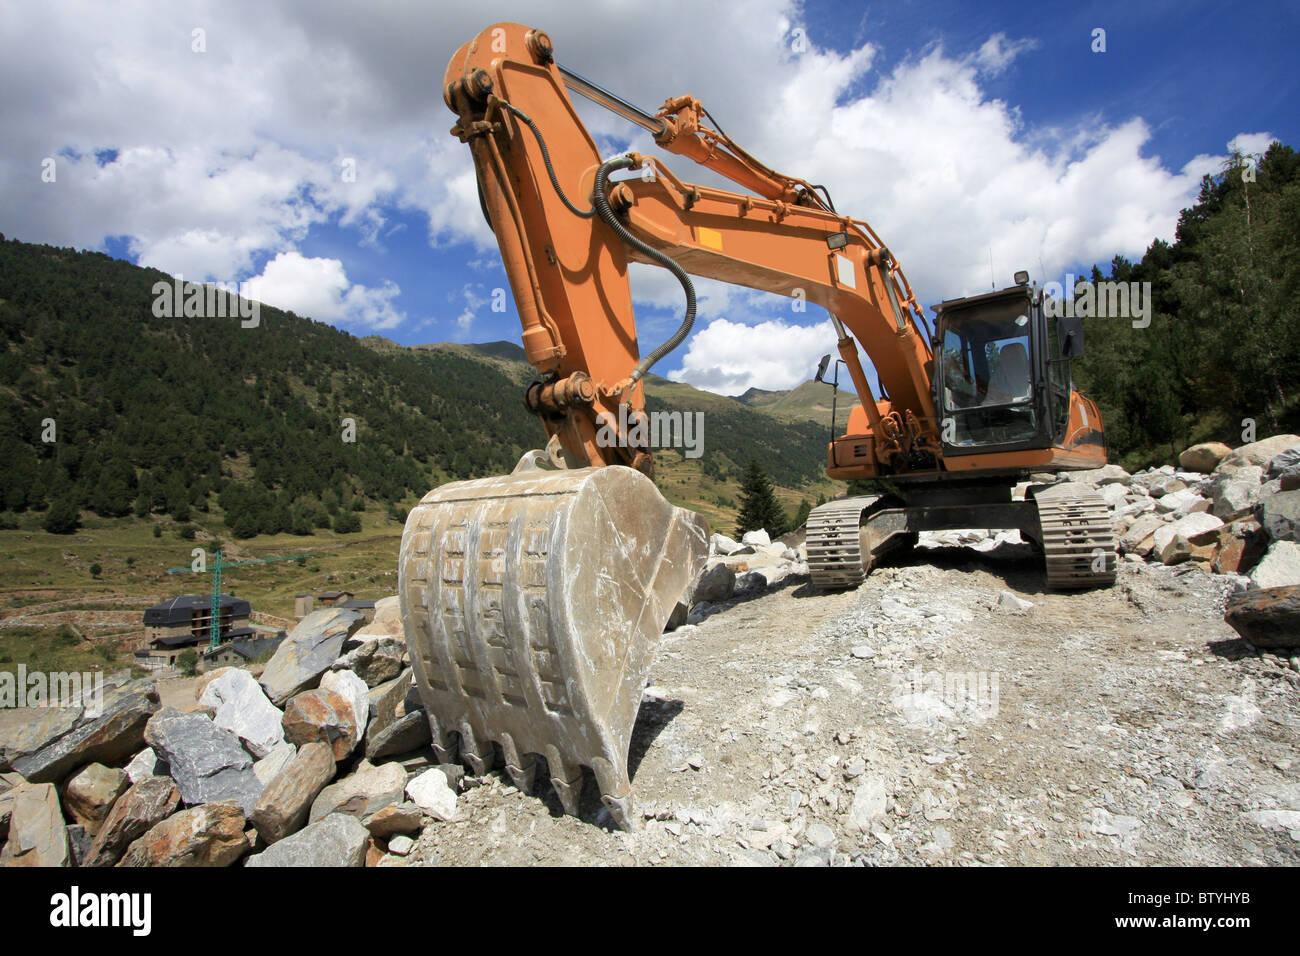 Excavator - Road Construction - Stock Image